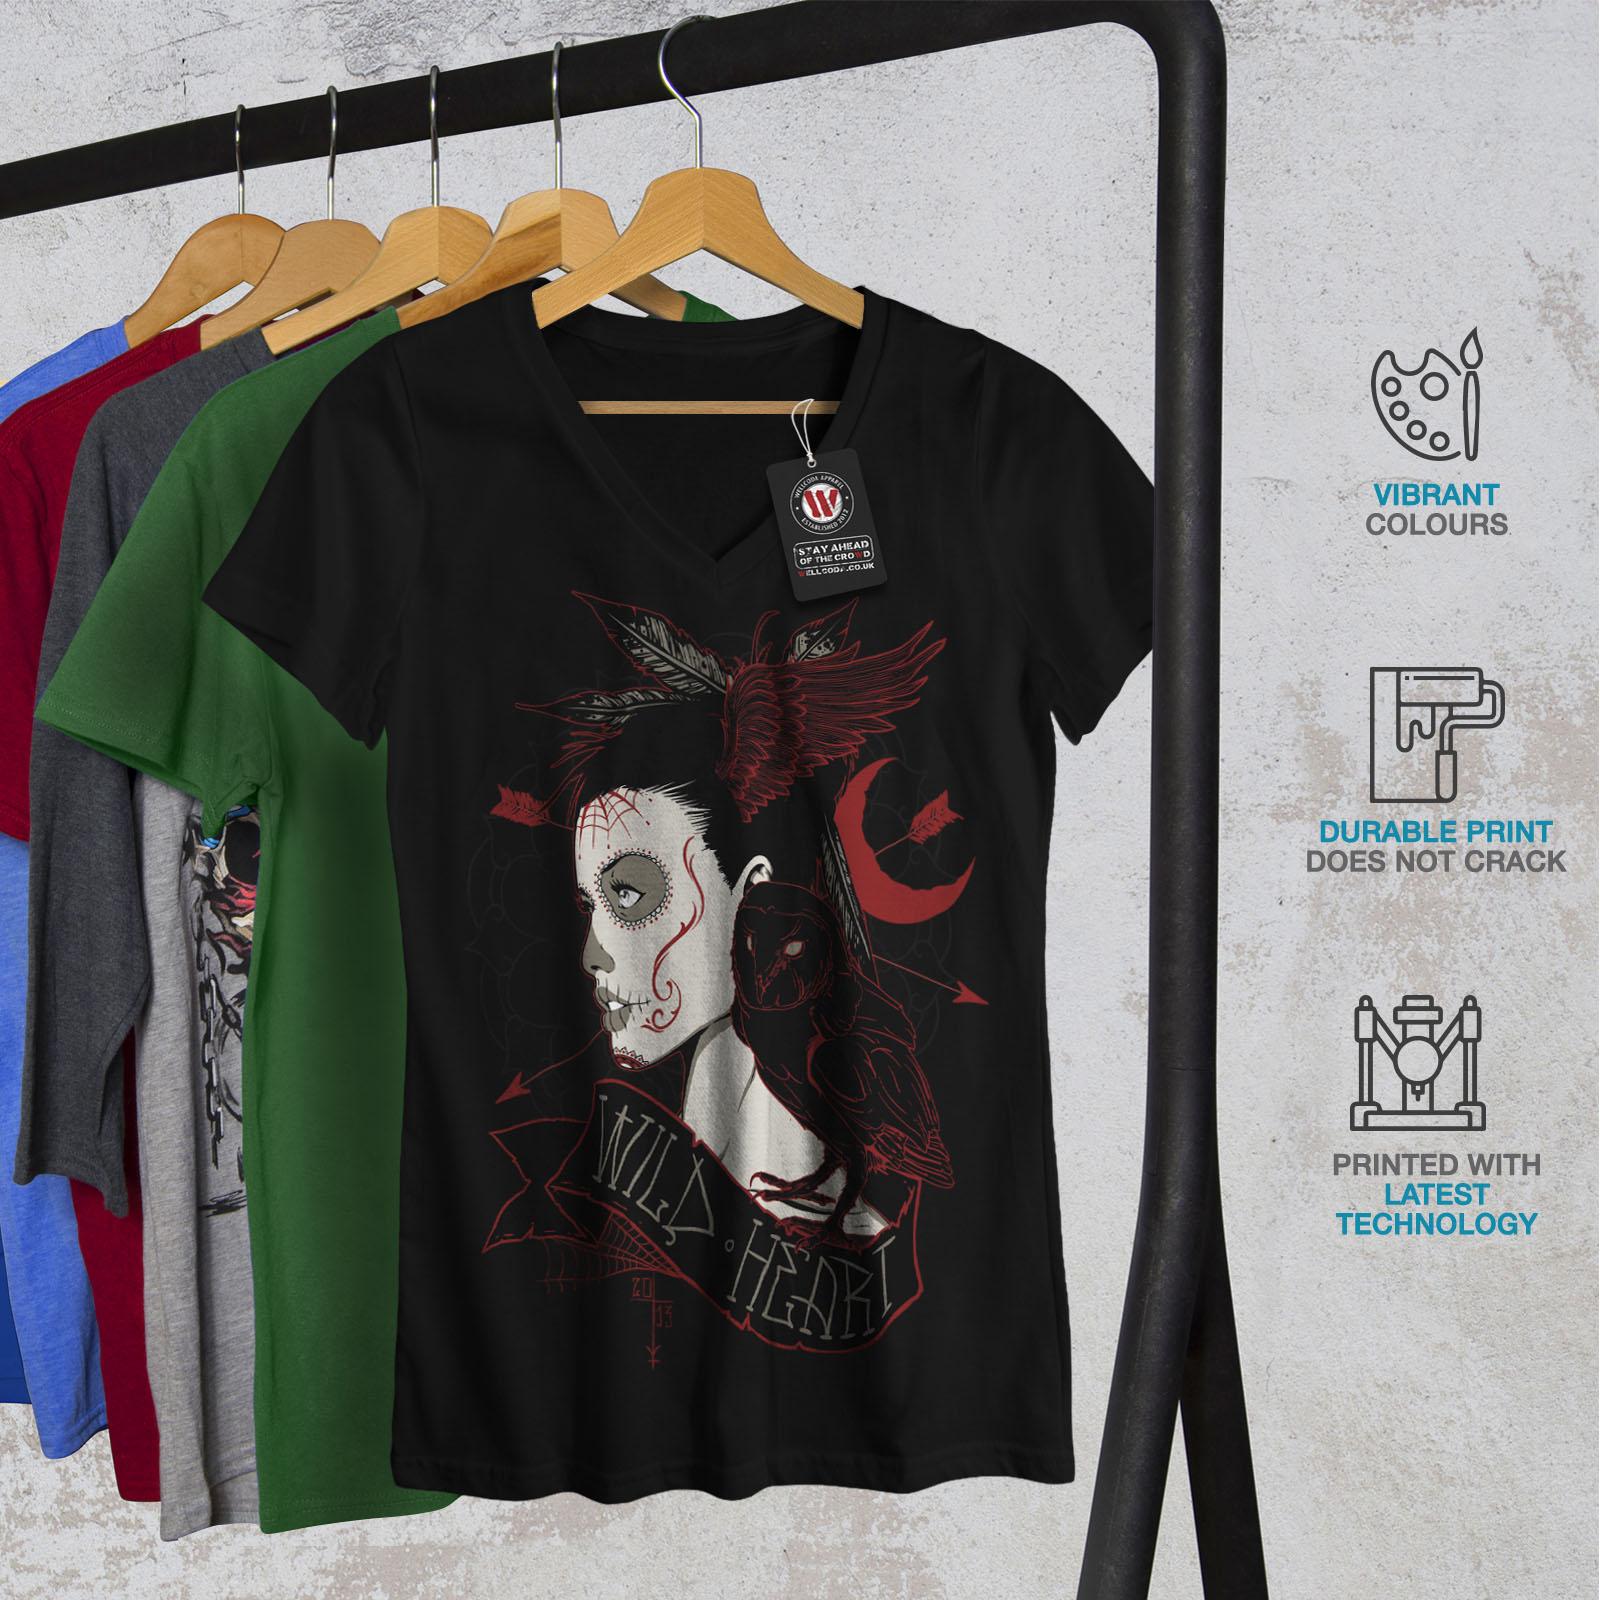 Wellcoda Wild Heart Girl FANTASY femme t-shirt col V mal conception graphique Tee